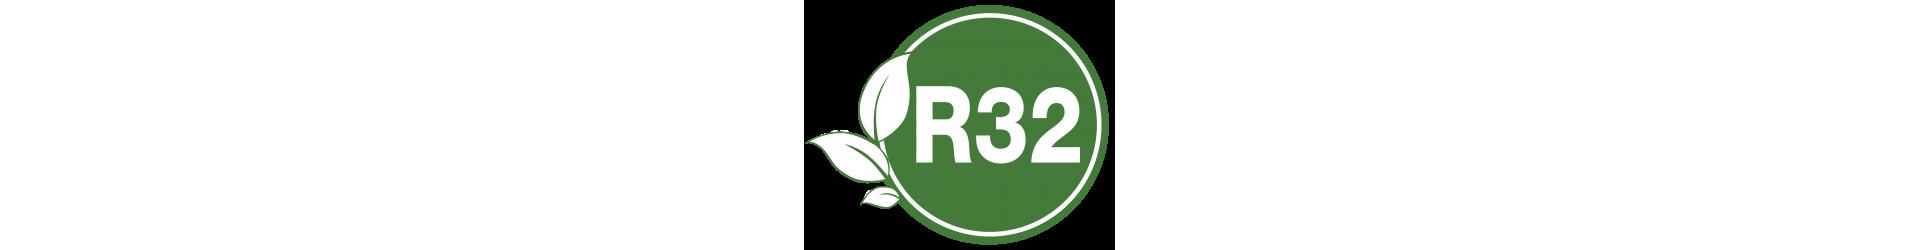 R32 Fujitsu